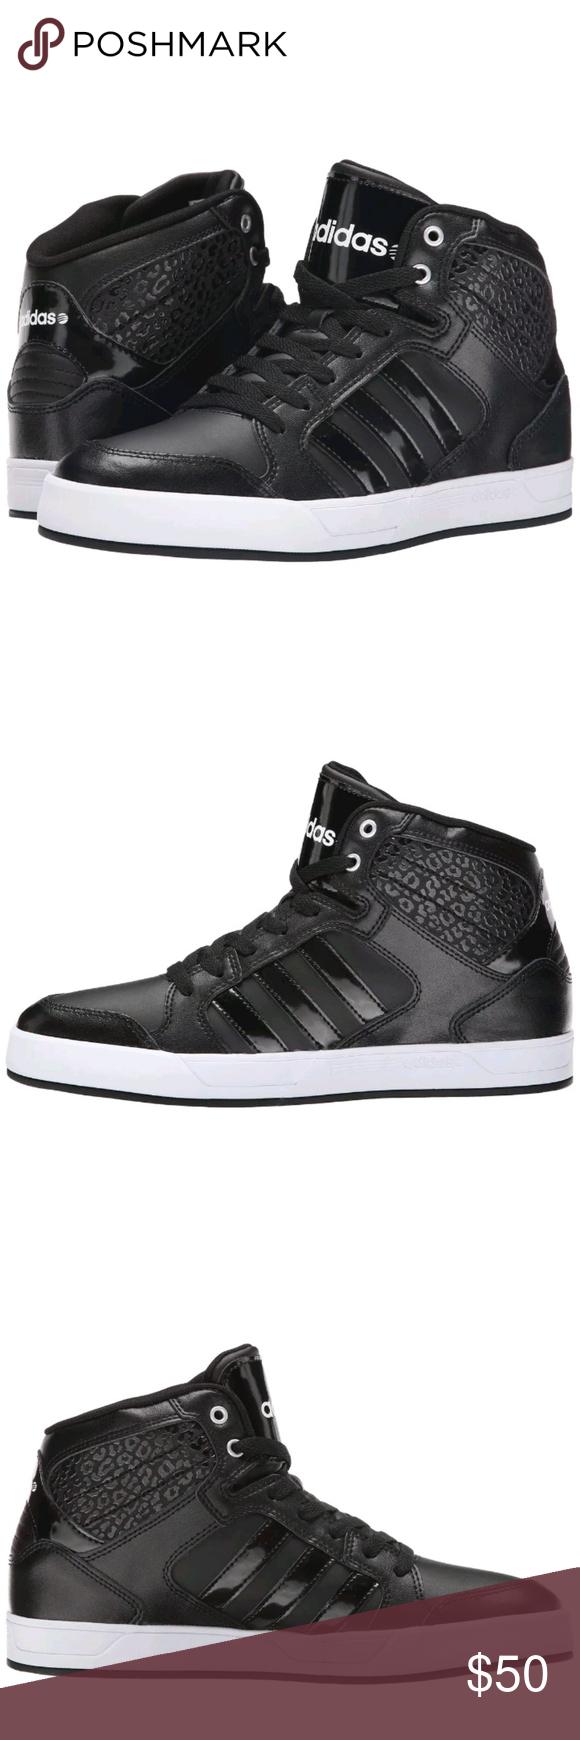 Adidas neo Raleigh negro Mid W Leopard detalle negro Raleigh Pinterest leopardo 81389e